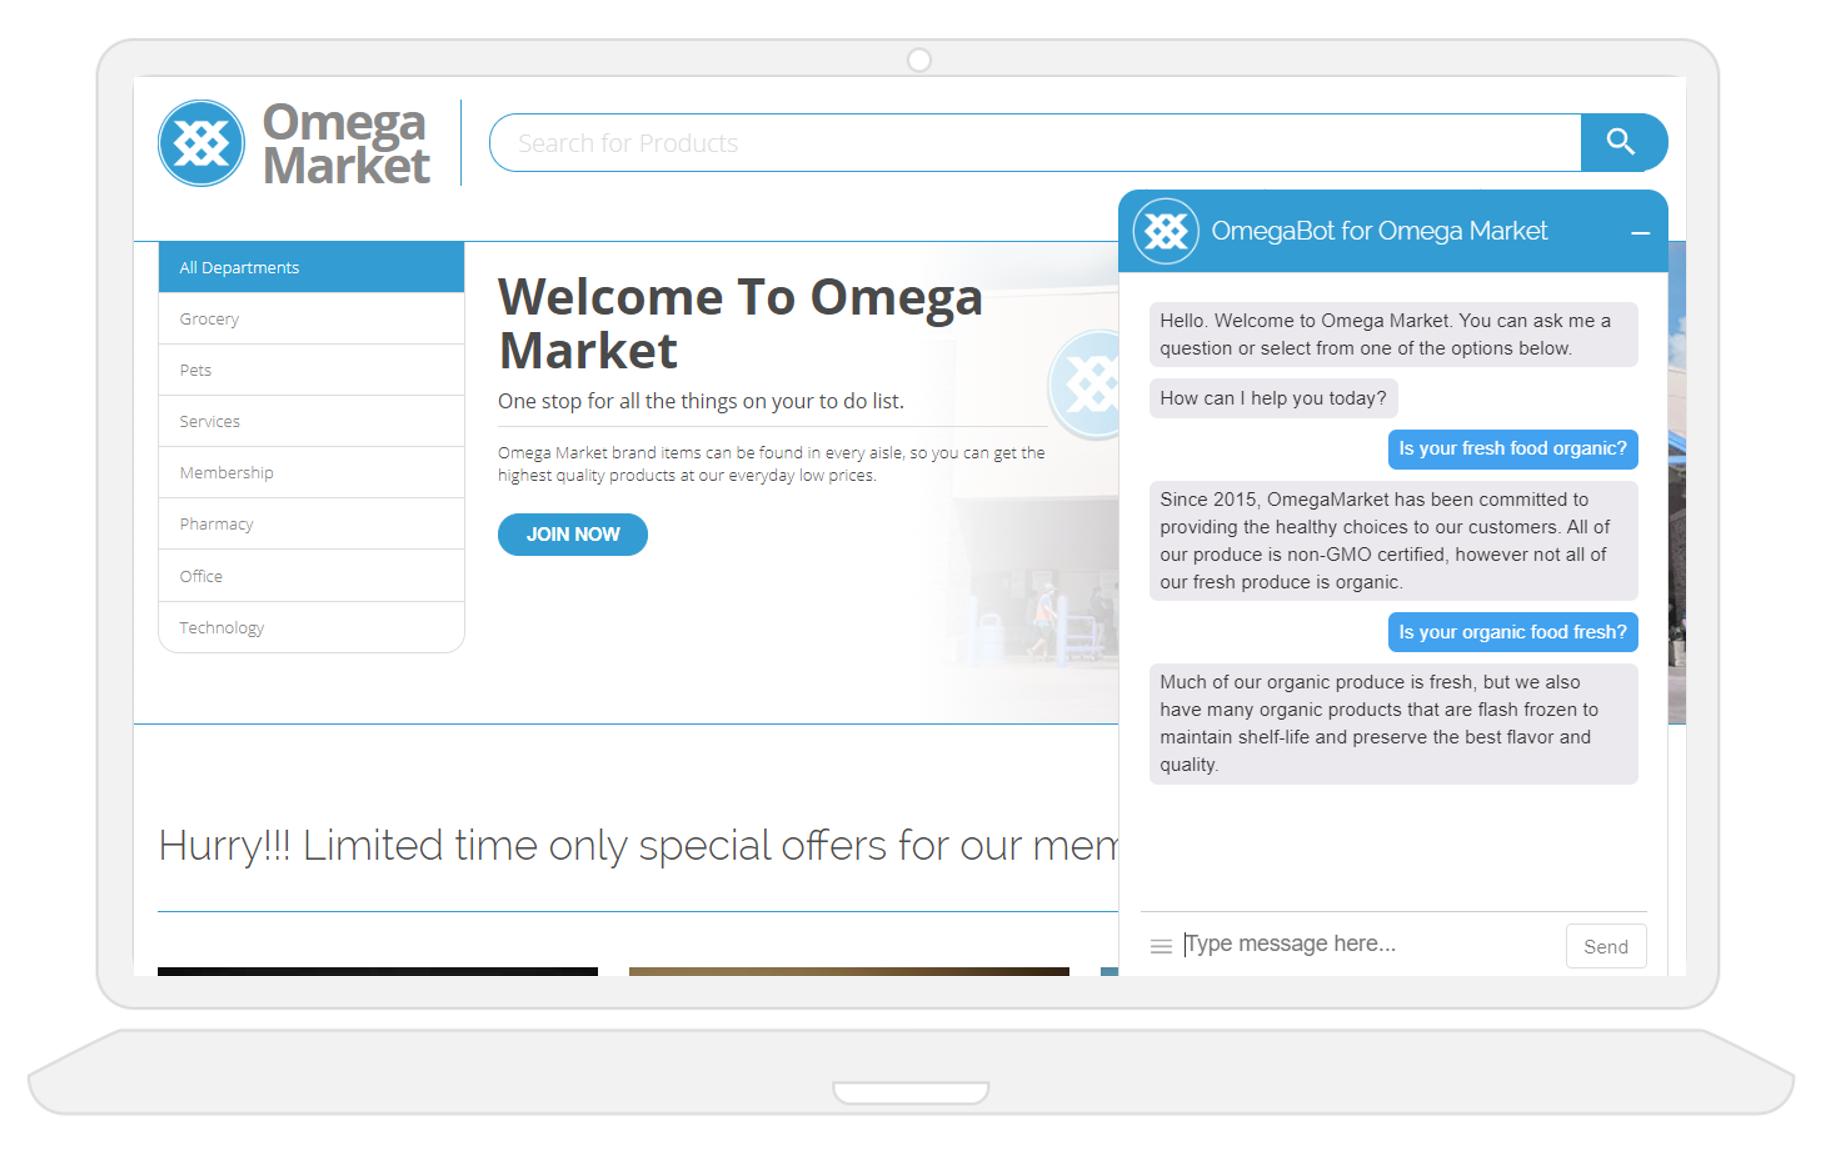 customer service bot using natural language processing NLP and AI